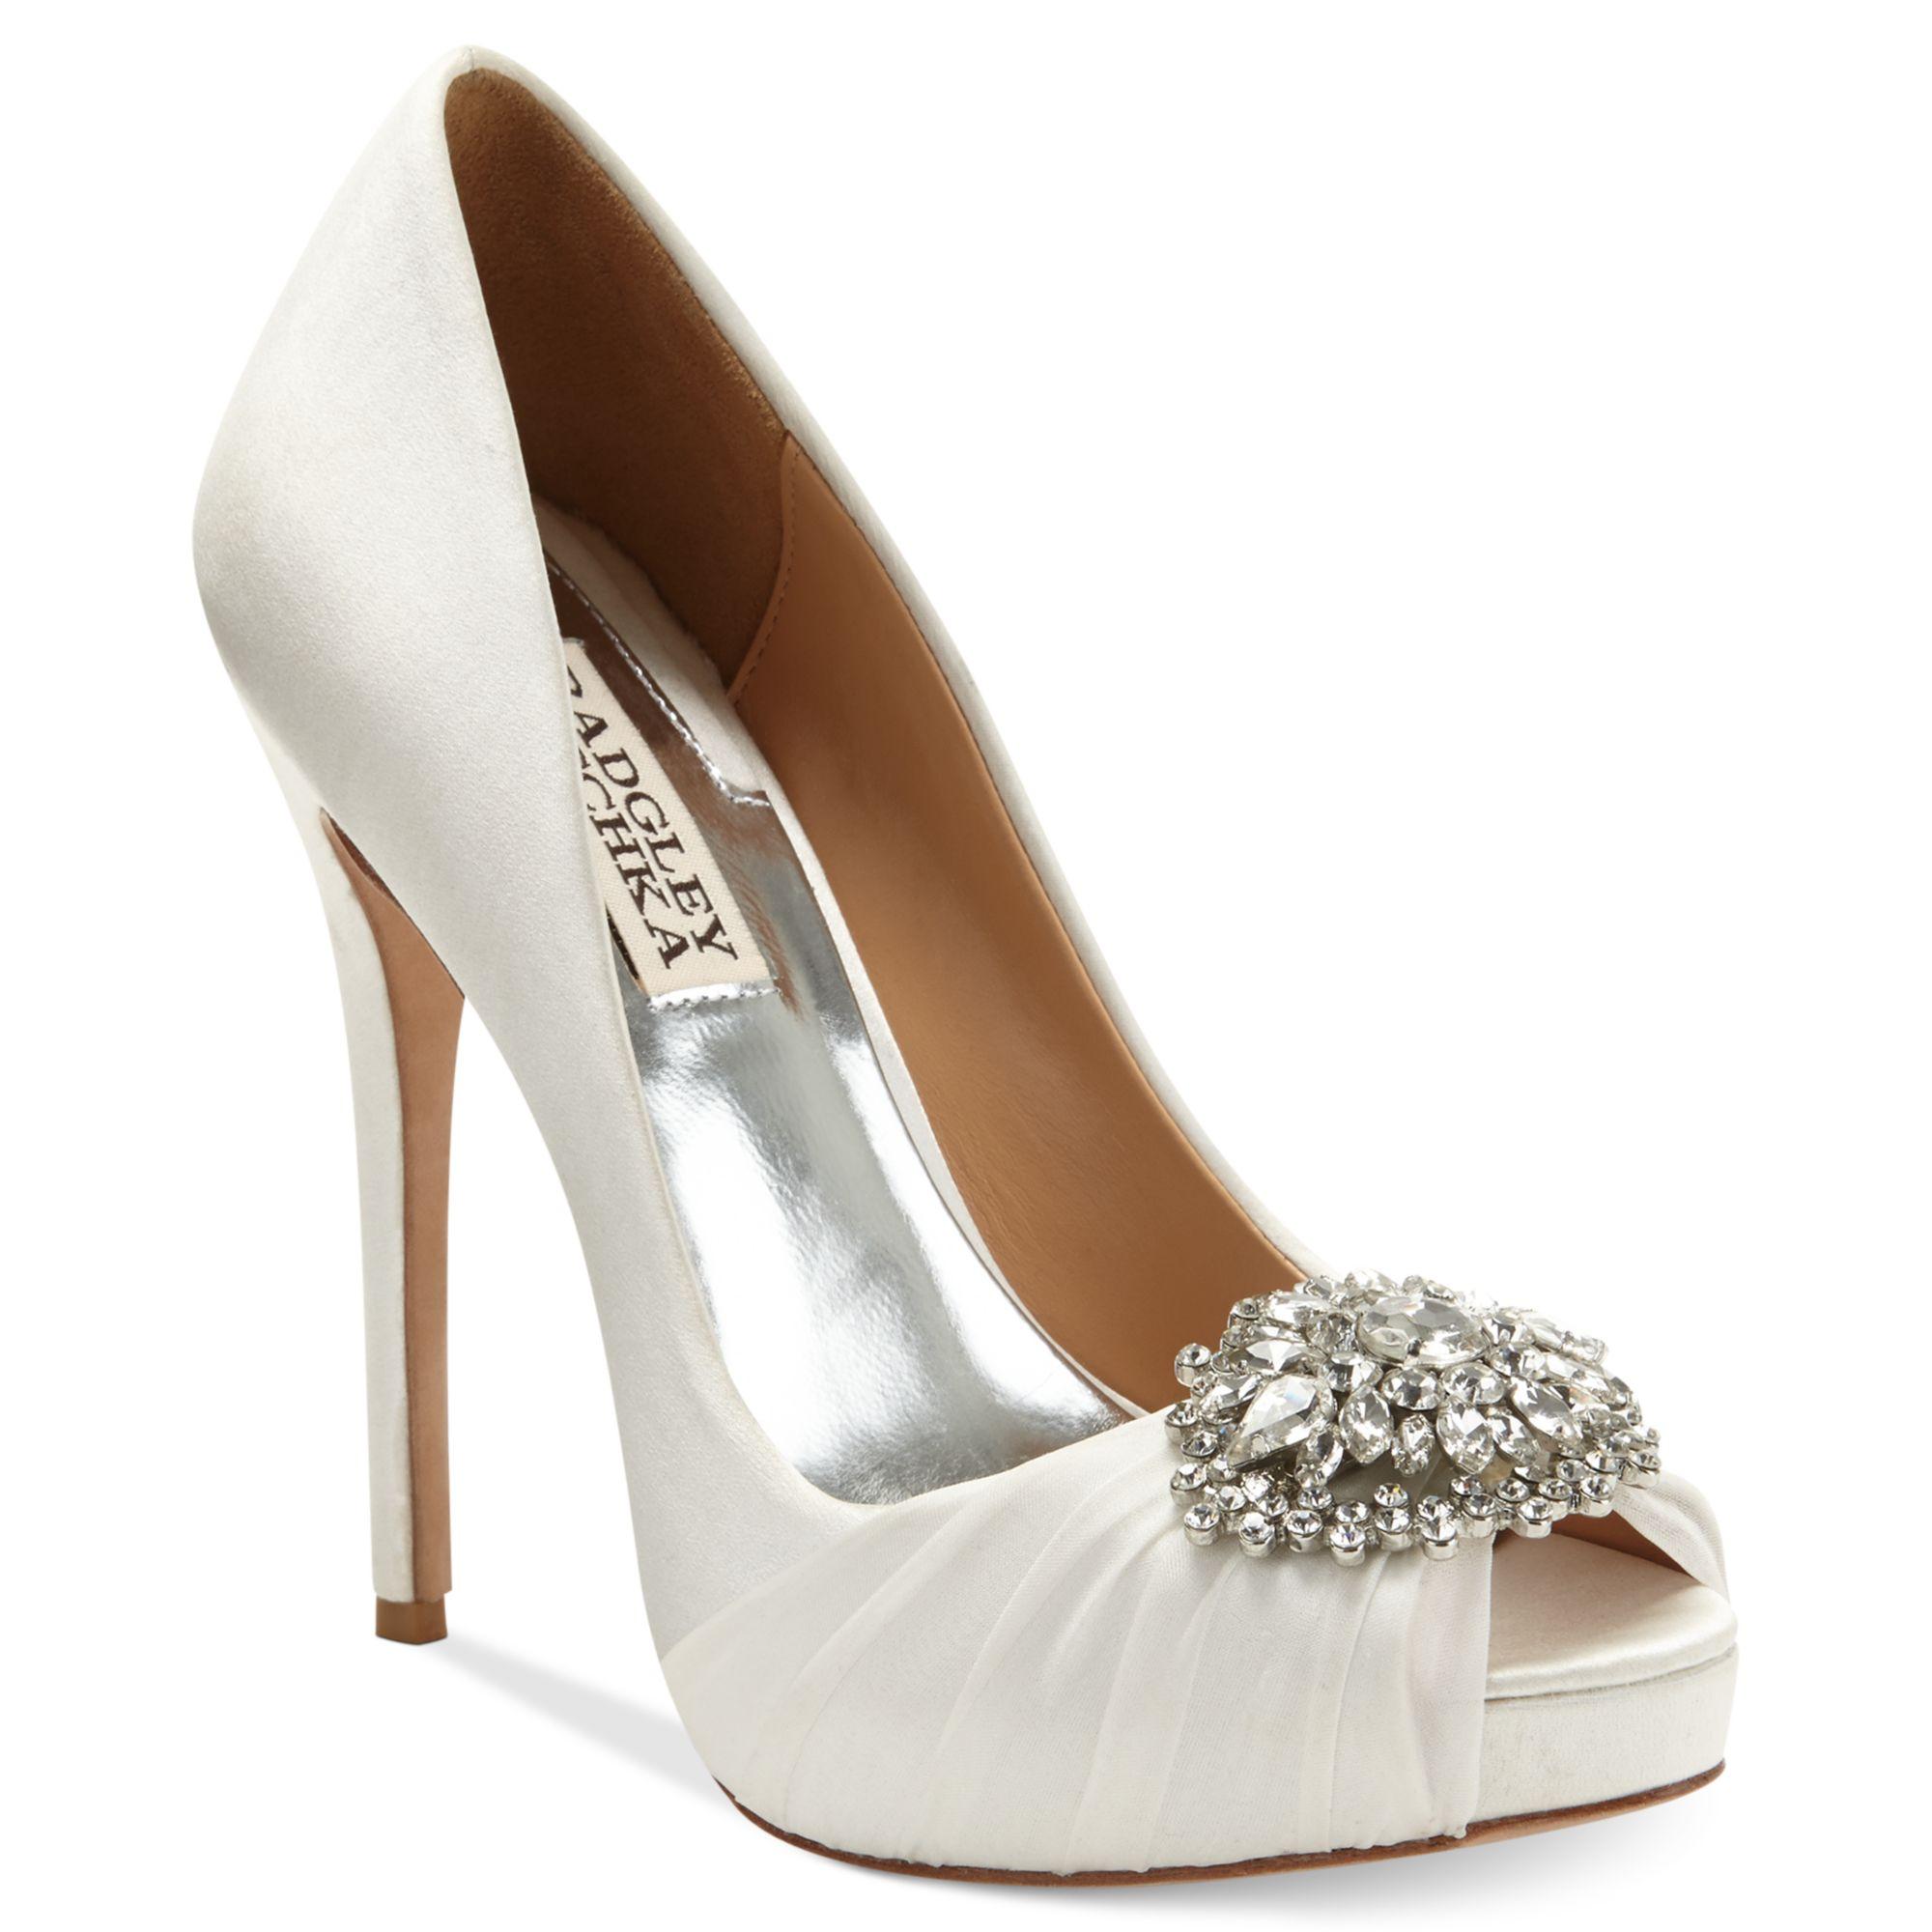 Badgley Mischka White Satin Shoes